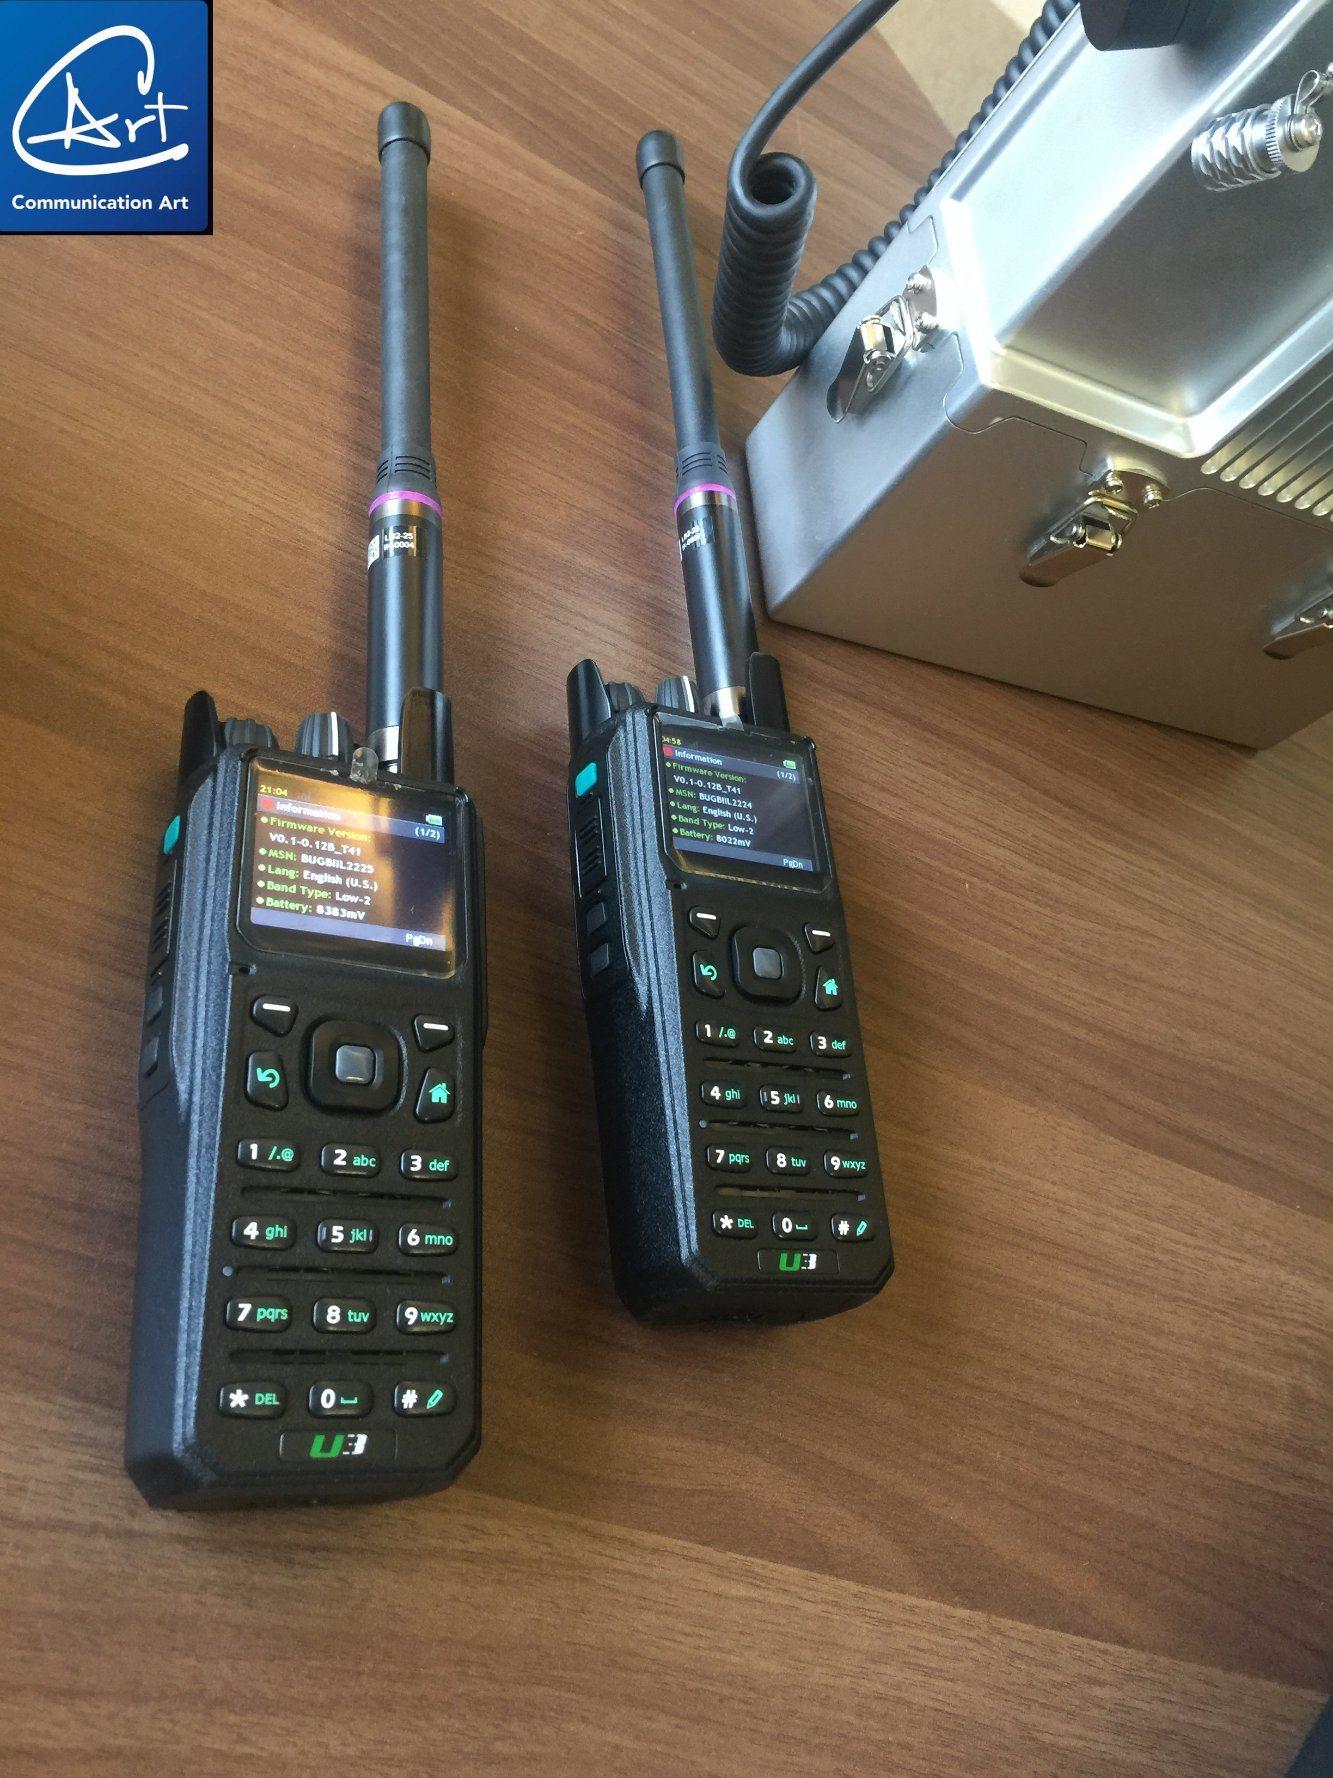 China Handheld Radio in P25 Conventinoal and P25 Trunking